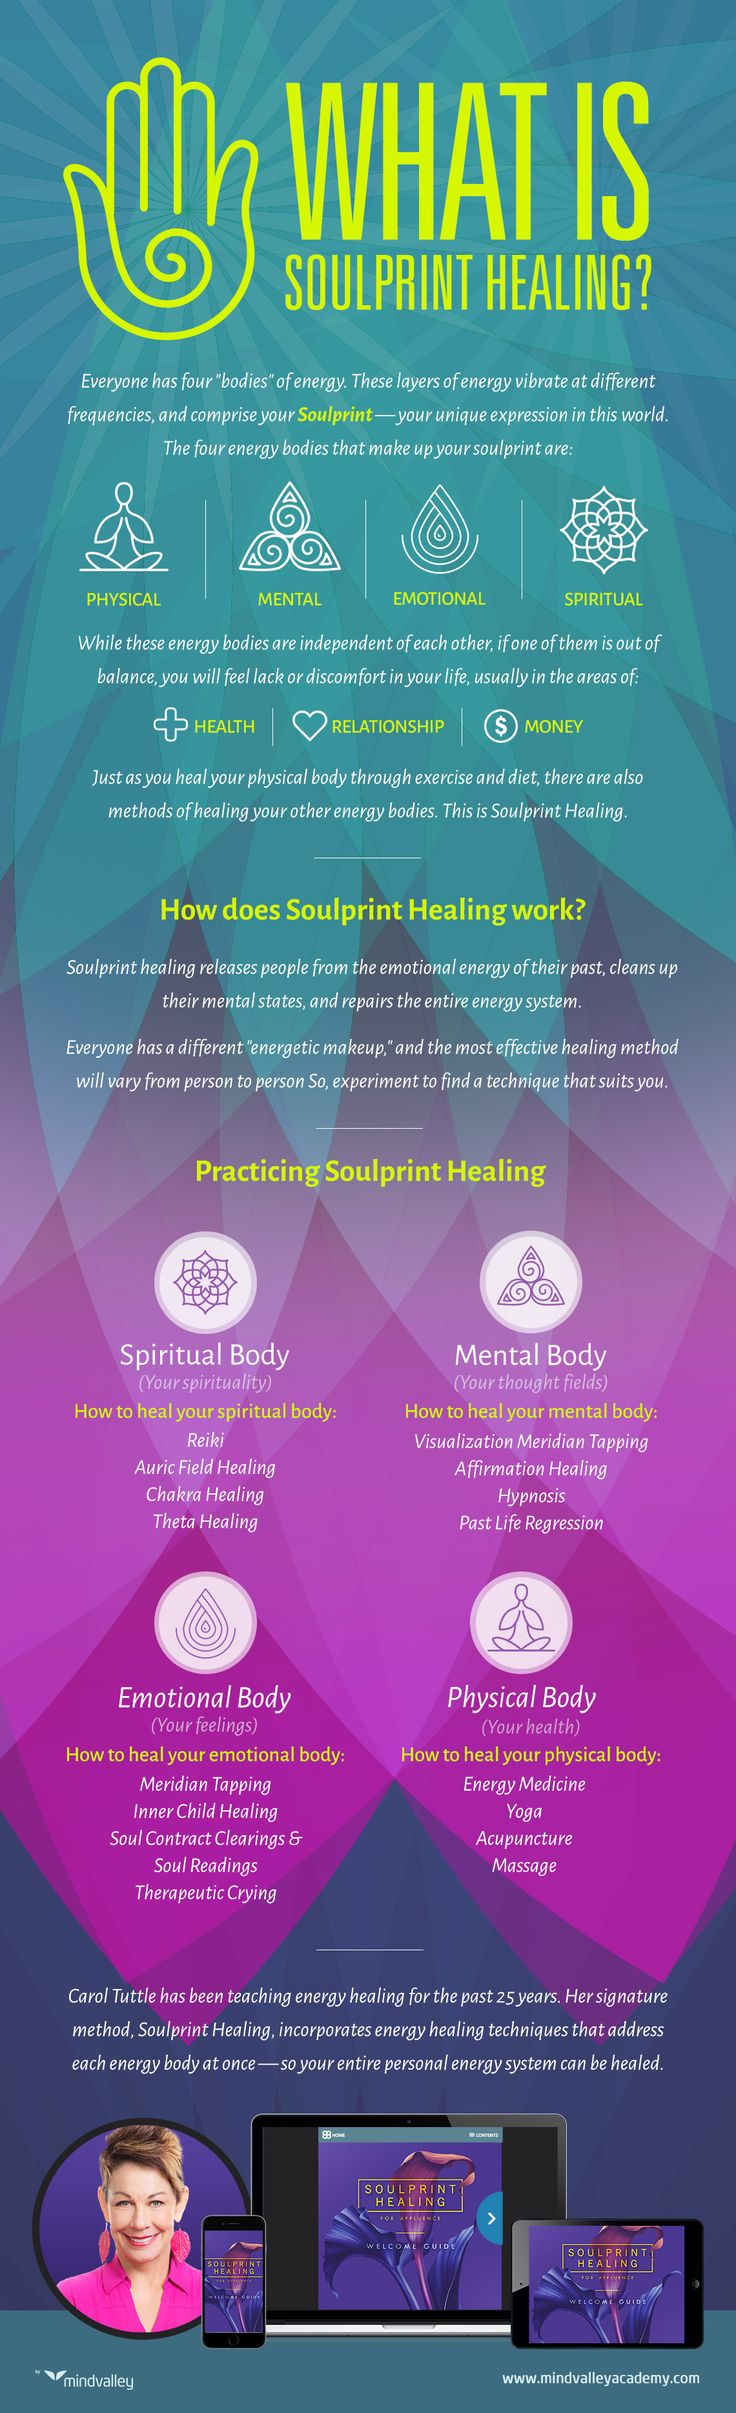 What Is Soulprint Healing - Carol Tuttle